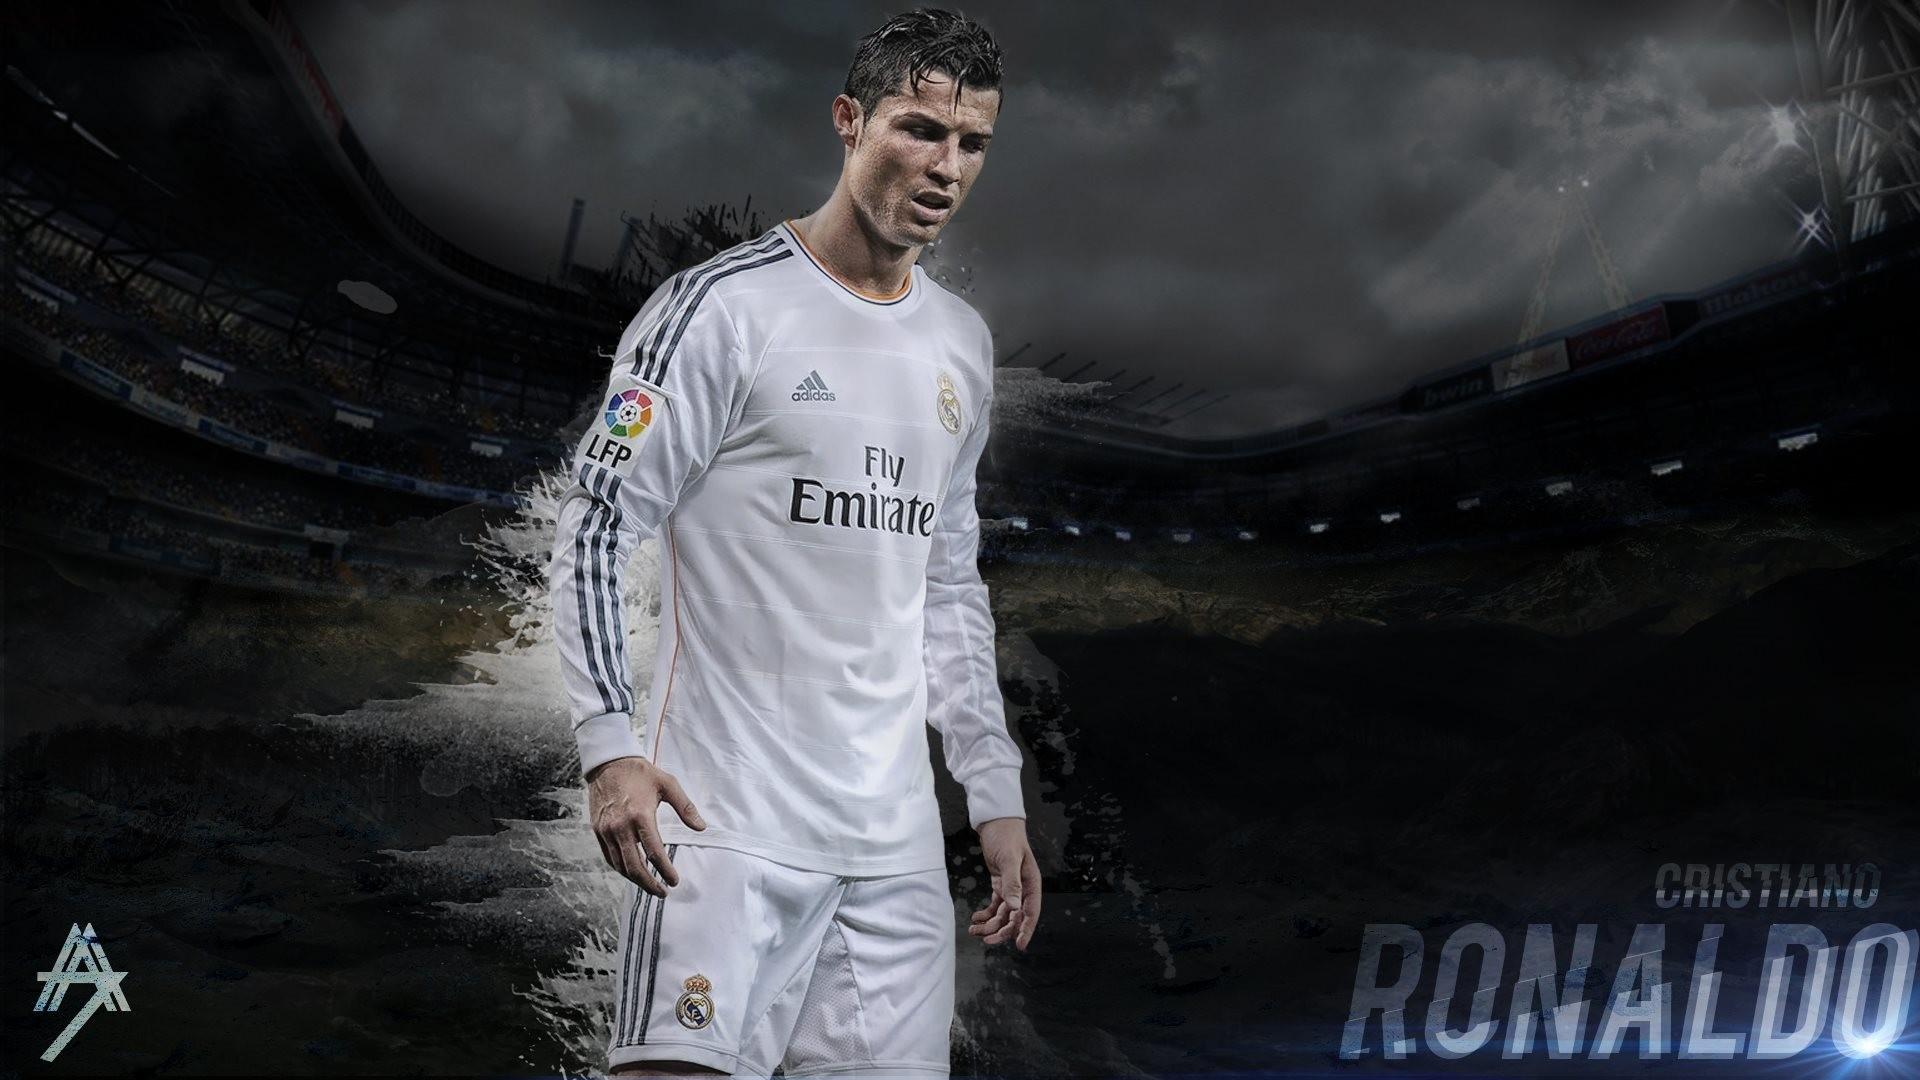 Cristiano ronaldo wallpaper 1080p 74 images - Download cr7 photos ...